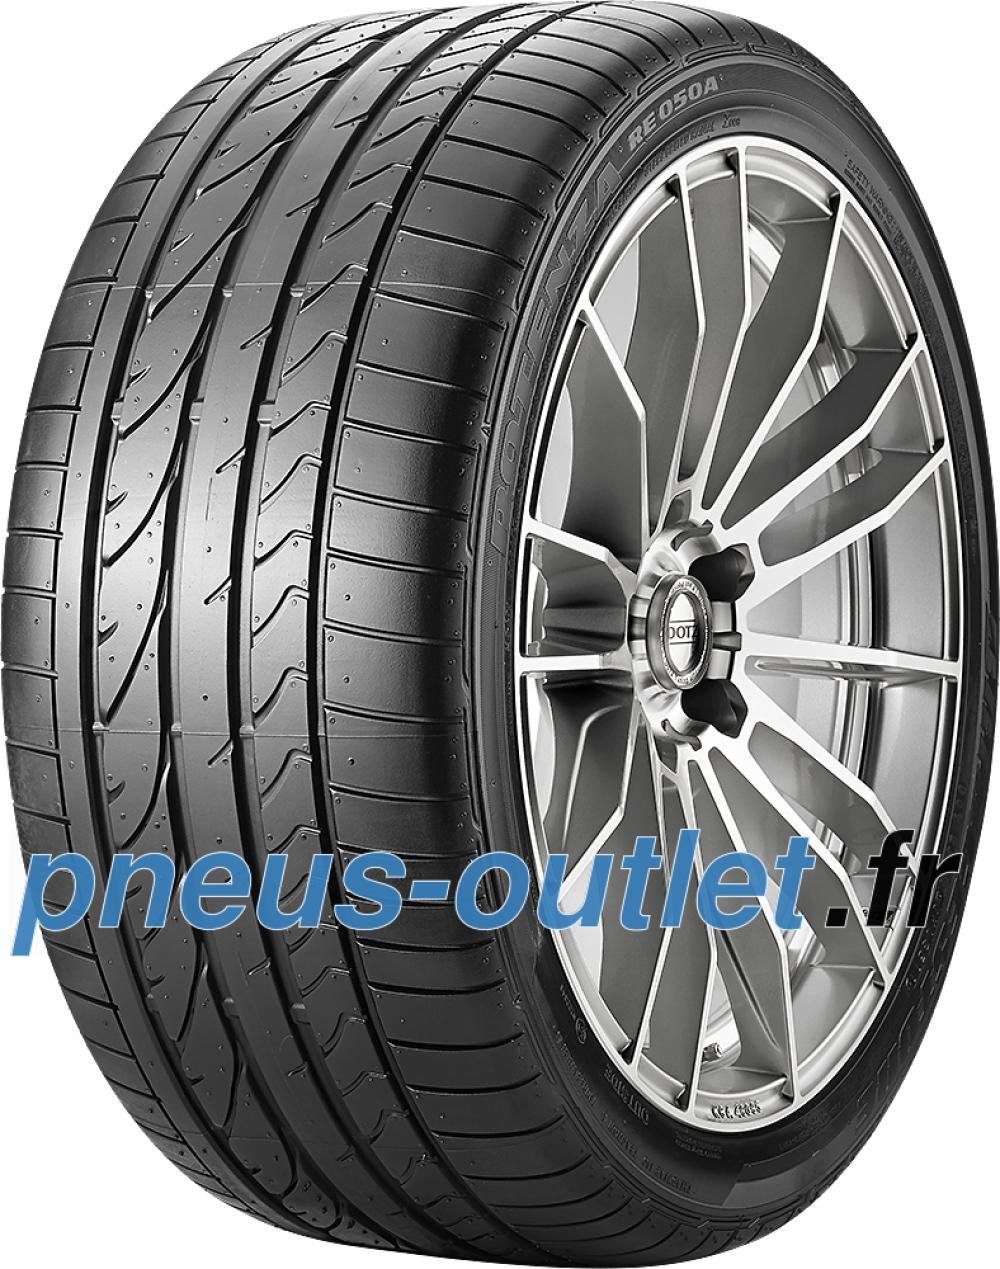 Bridgestone Potenza RE 050 A RFT ( 225/45 R17 91W runflat, *, avec protège-jante (MFS) )